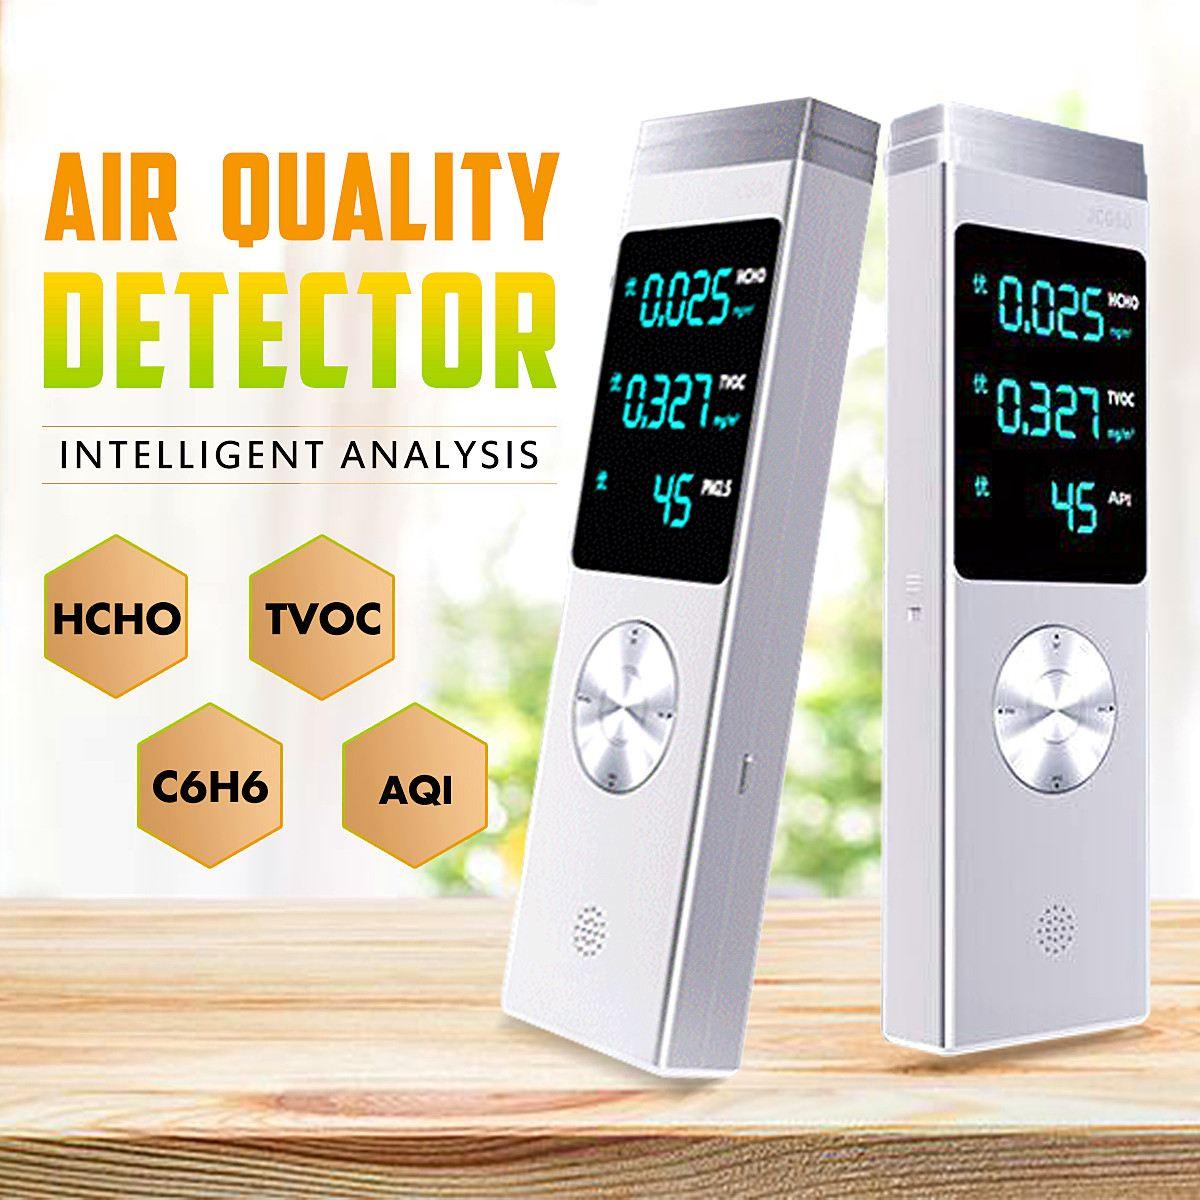 Air Kwaliteit Monitor Oplaadbare Usb Digitale Pro Lucht Detector Hcho Tvoc Api Handheld Air Gas Kwaliteit Monitor Diagnostic Tool